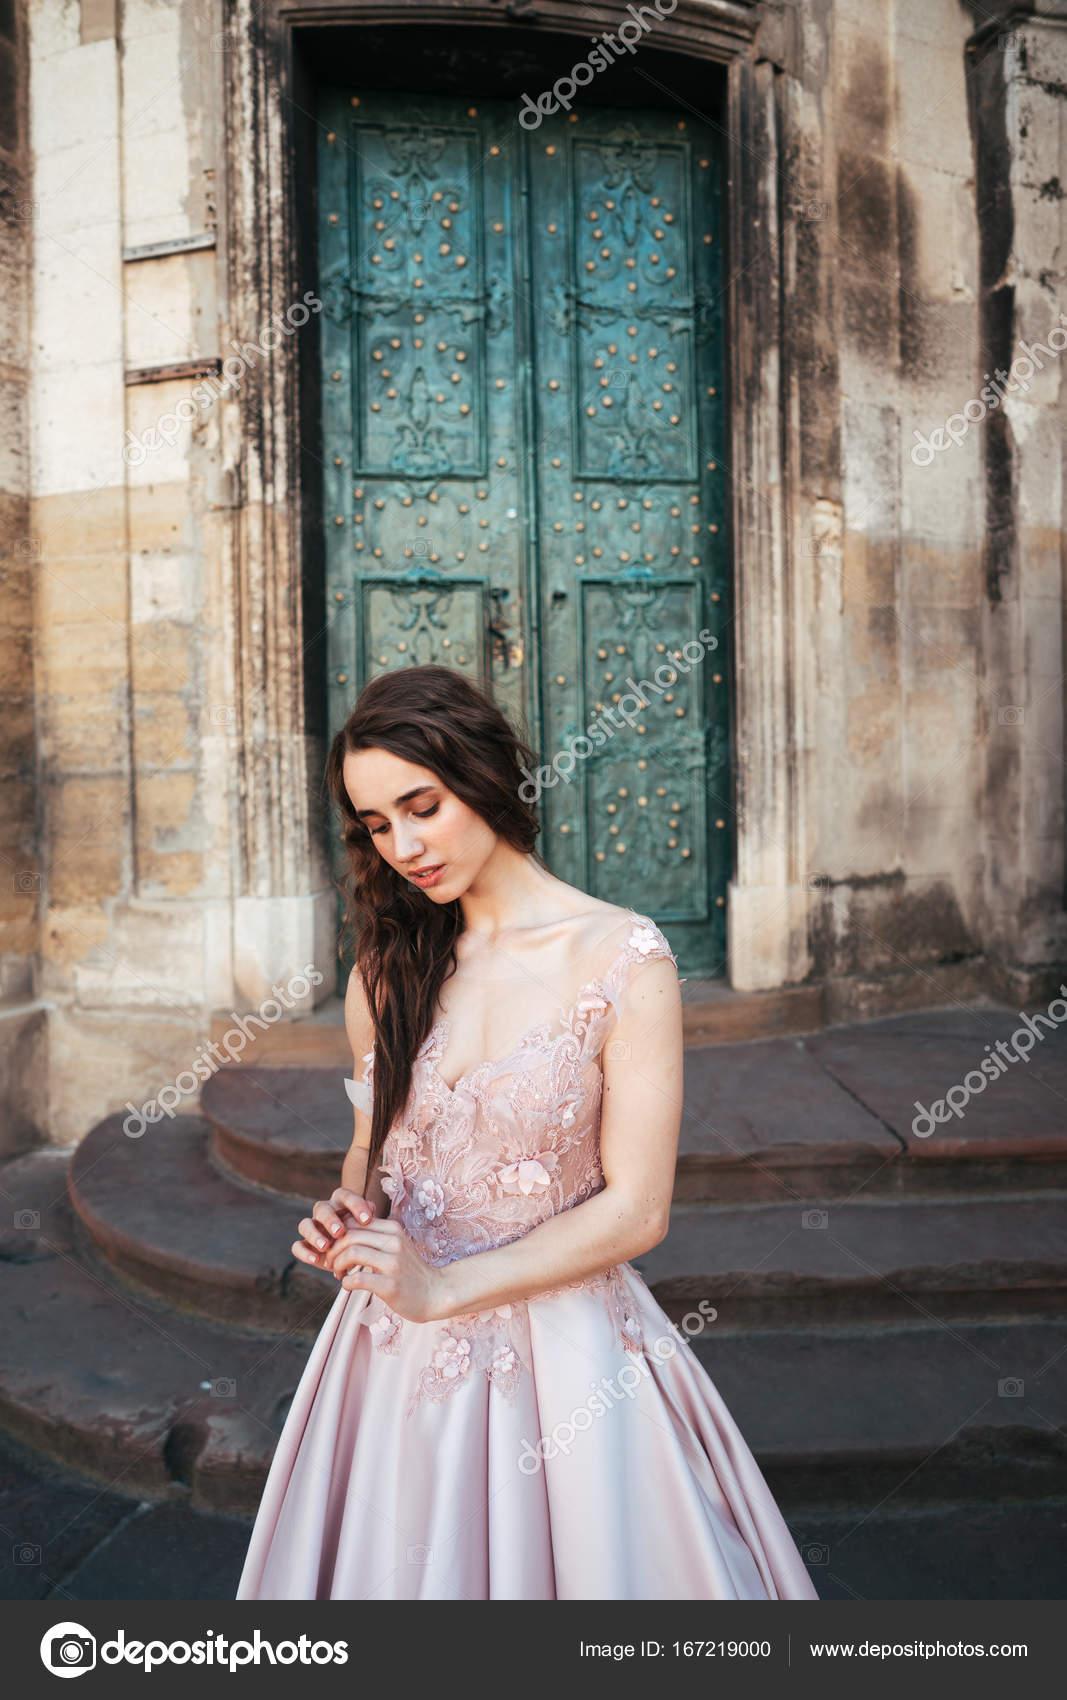 73cd9b3b1251 Μοντέλο νεαρή όμορφη γυναίκα σε ένα κομψό βραδινό φόρεμα ποζάρουν με φόντο  την πόλη από το μπαλκόνι του ένα παλιό κτίριο — Εικόνα από ...